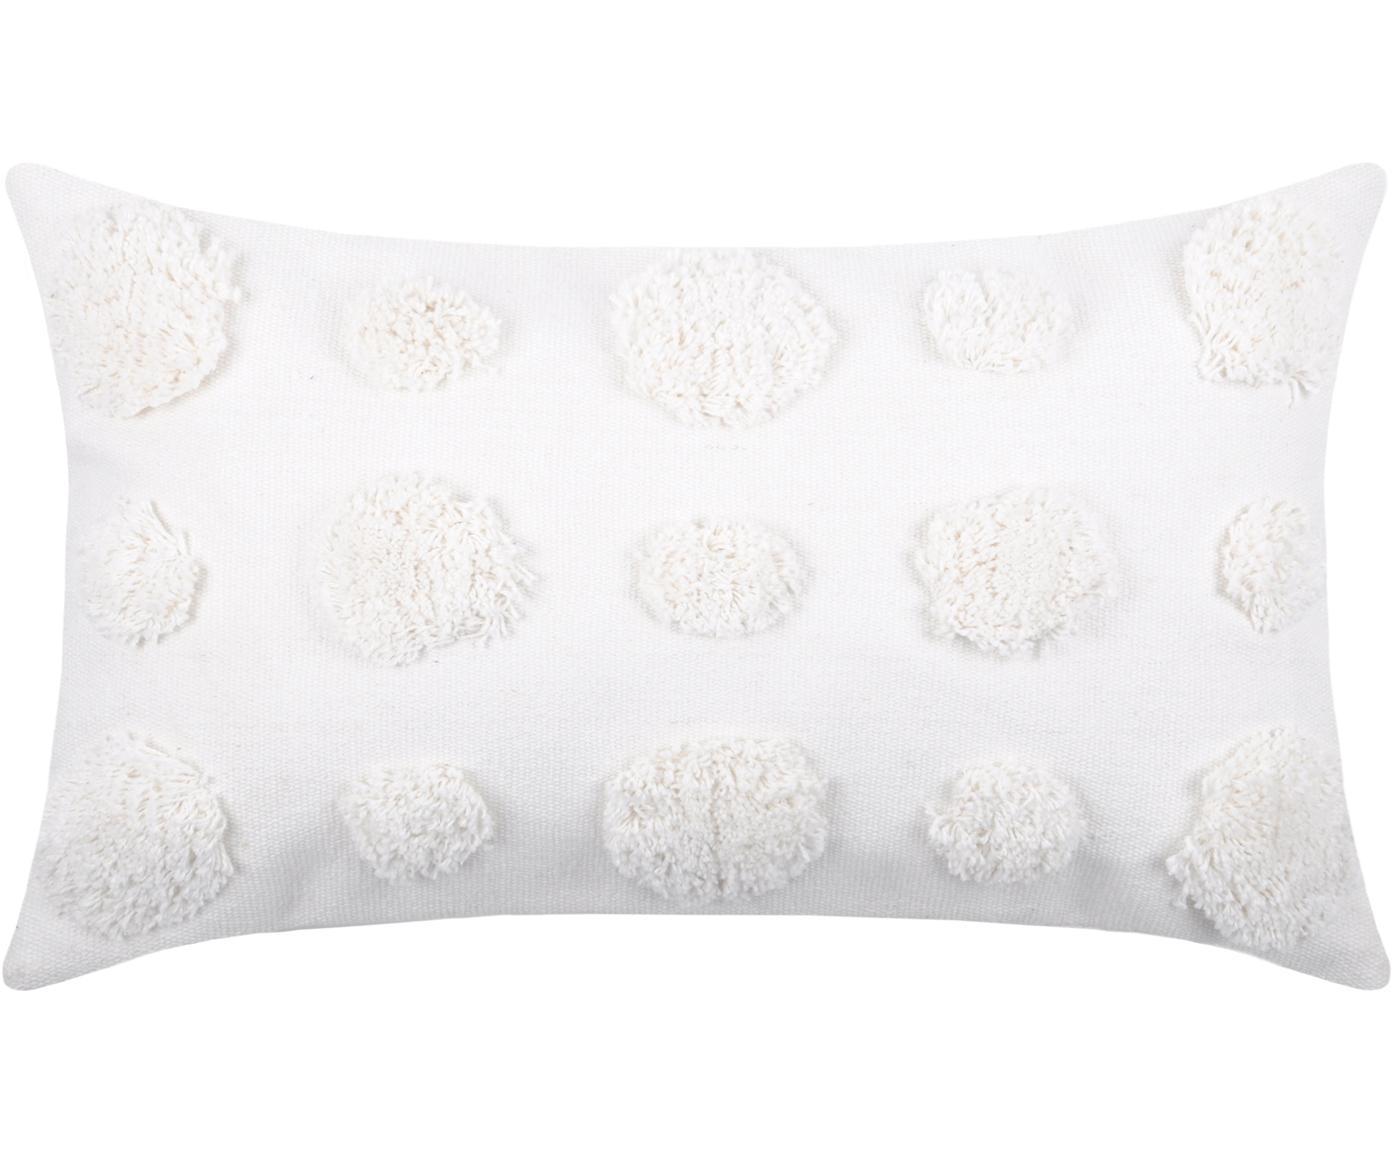 Cojín texturizado Sudda, con relleno, Funda: algodón, Blanco, An 30 x L 50 cm